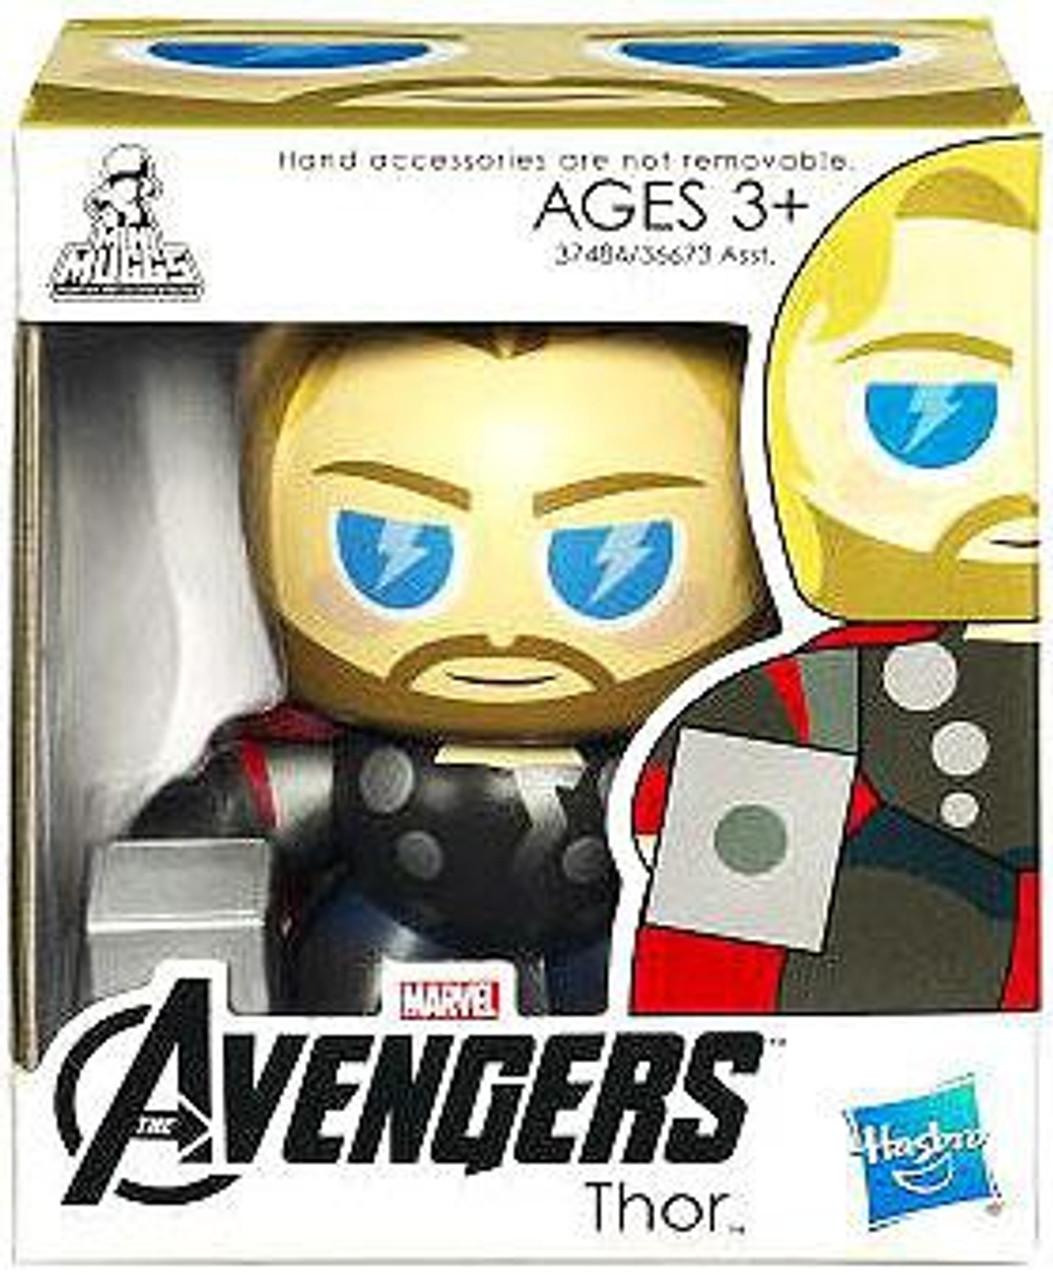 Marvel Avengers Mini Muggs Thor Vinyl Figure